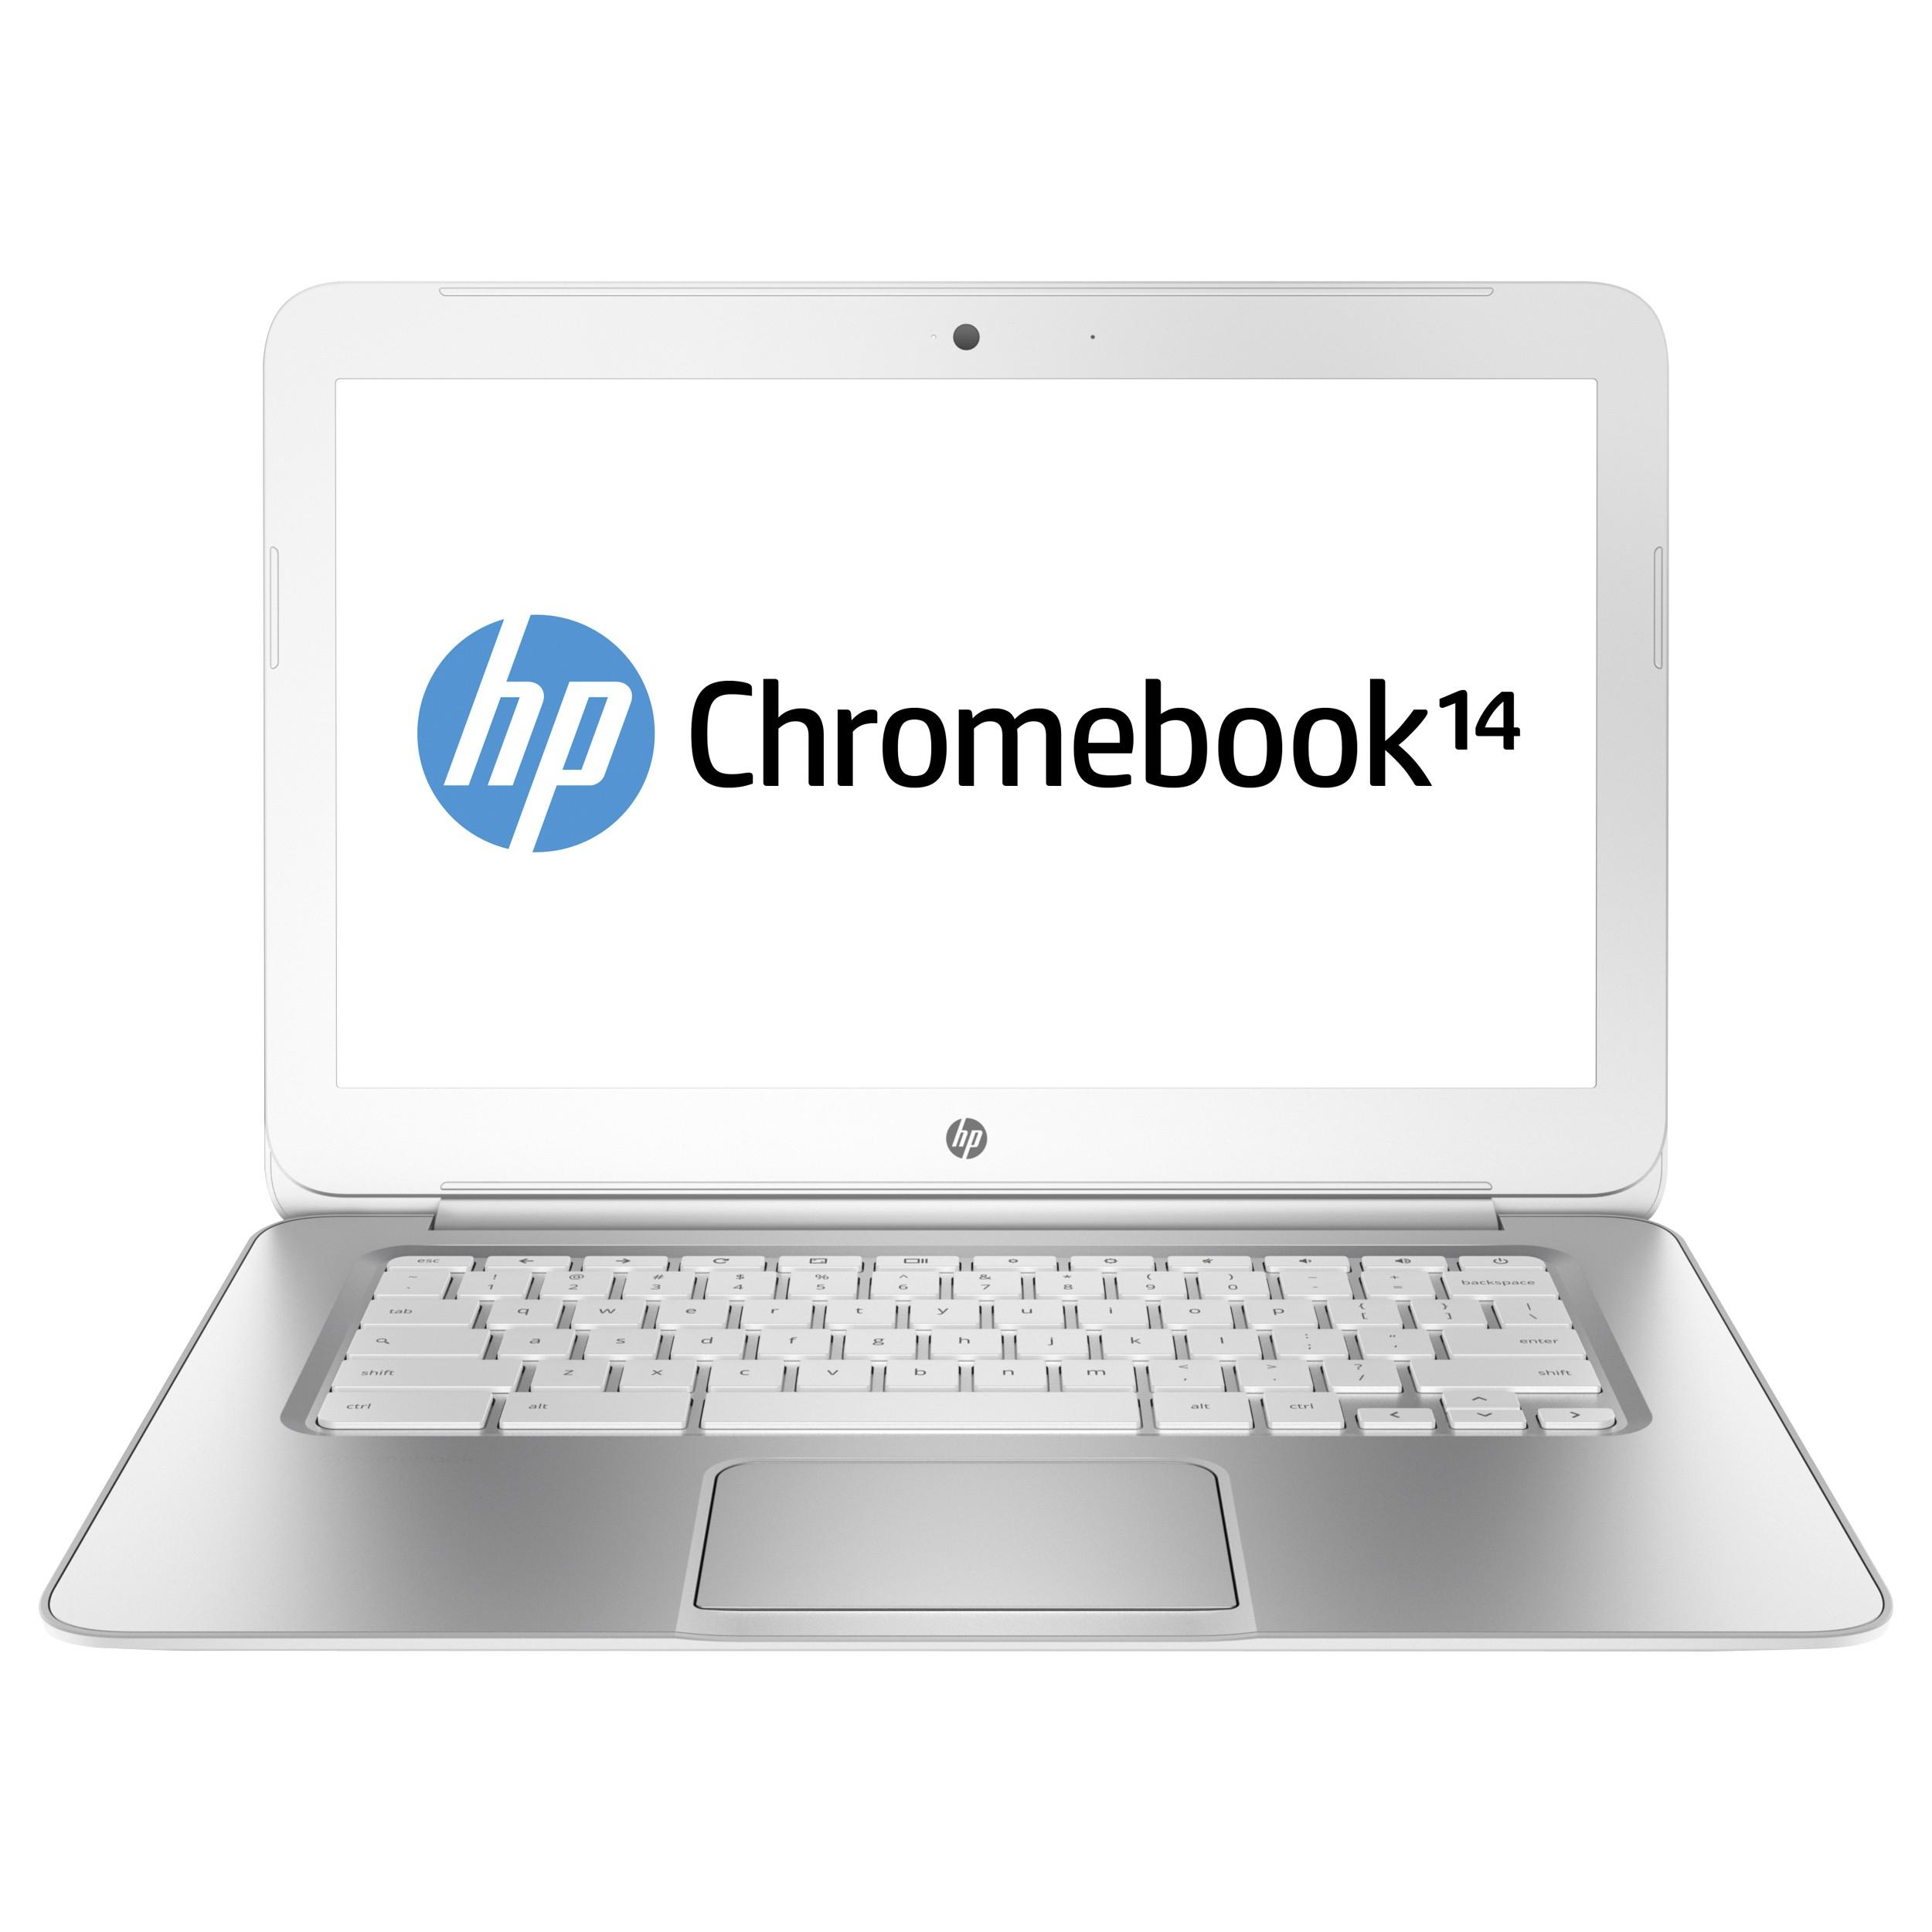 "HP Chromebook 14 G1 14"" Celeron 2955U 4 GB RAM 16 GB SSD (White) - F7W49UA#ABA (Refurbished, Scratches & Dents)"